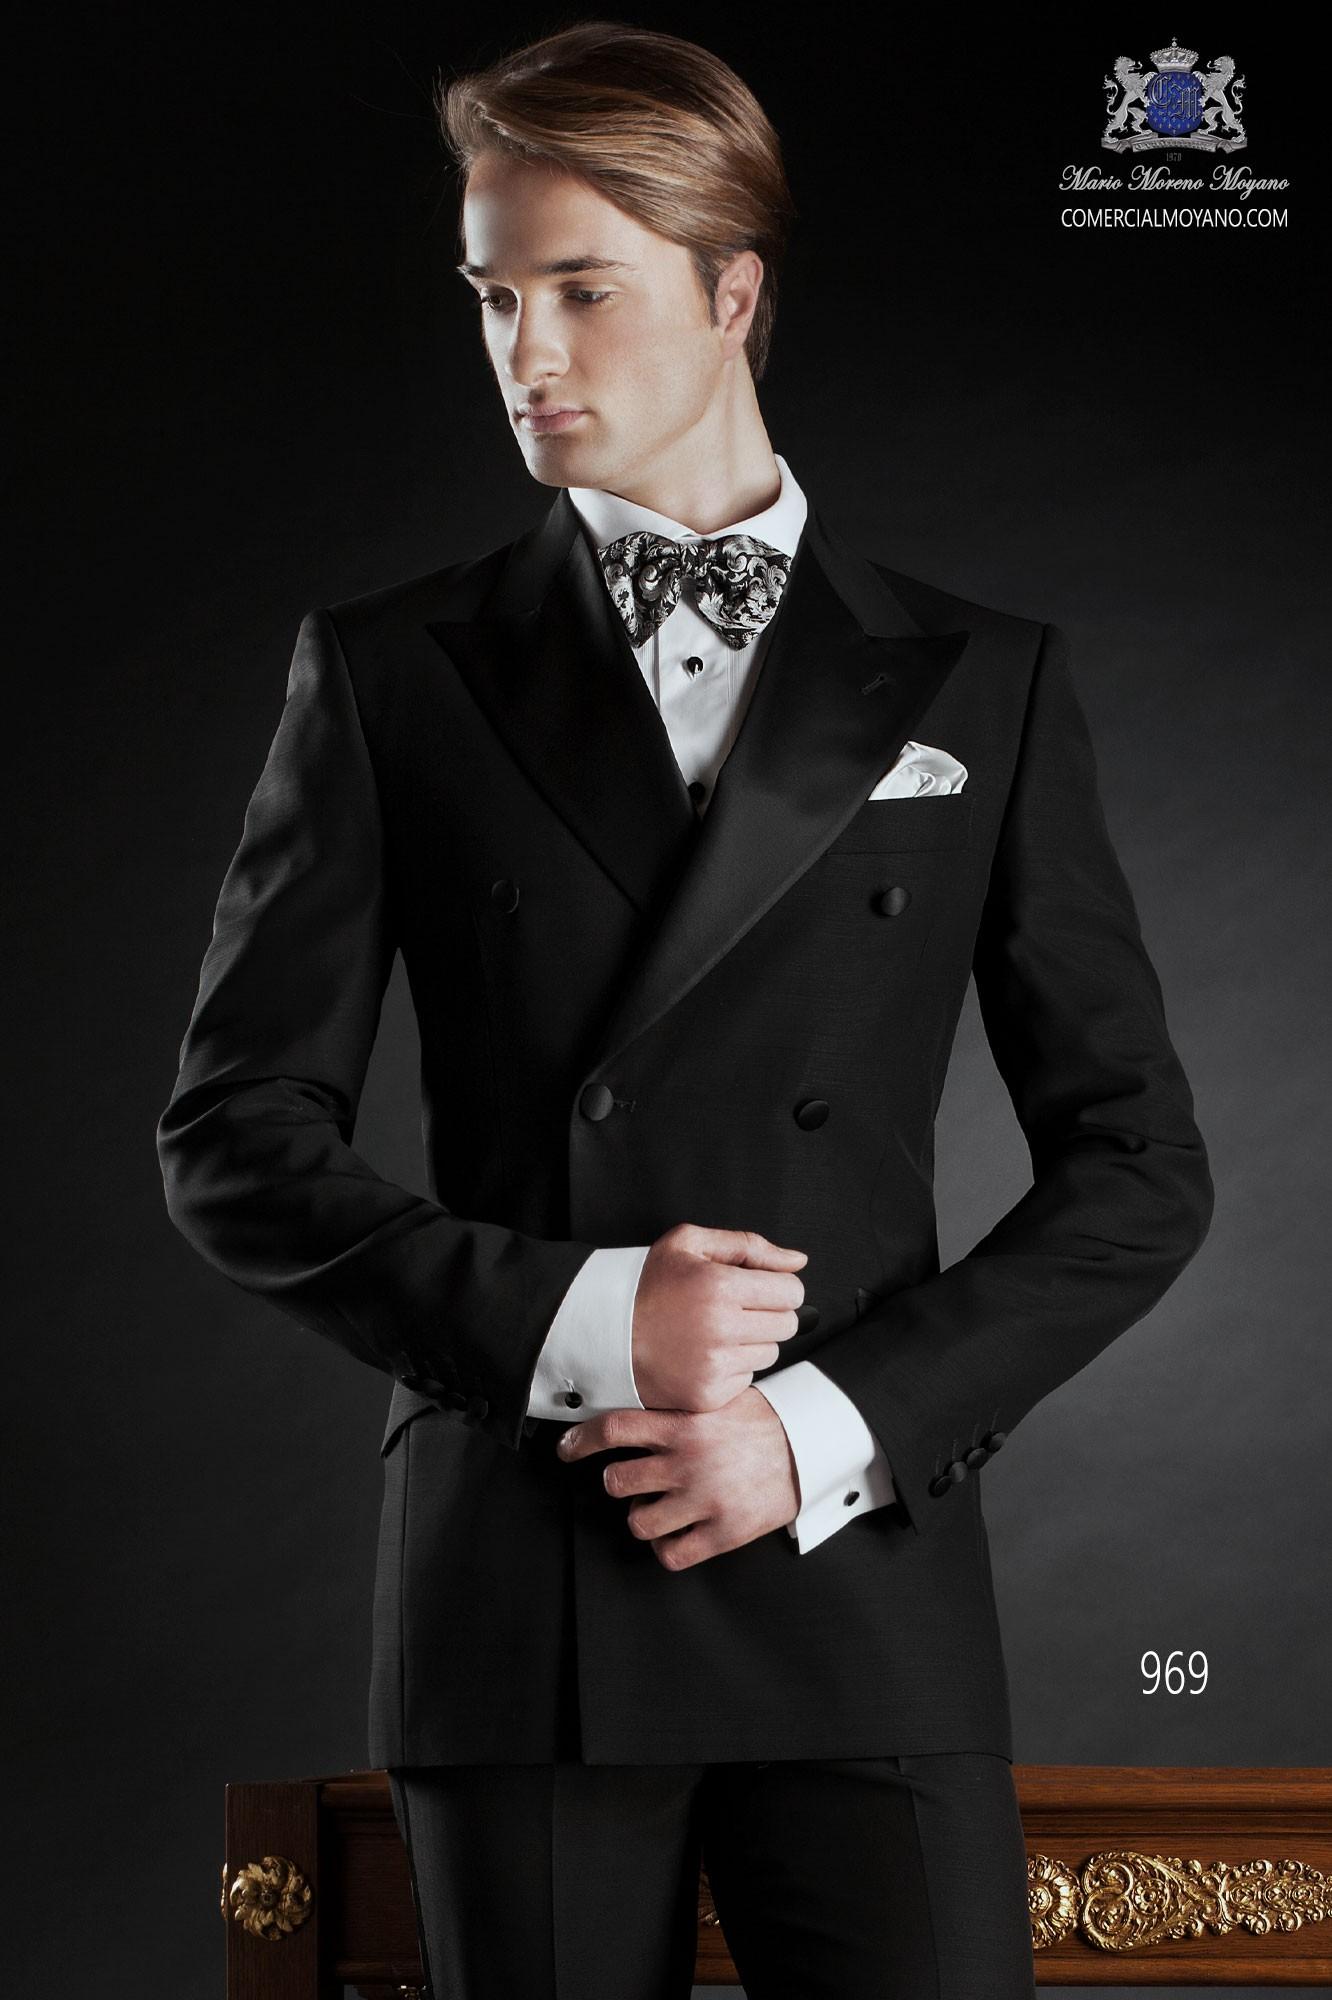 Black Tie black men wedding suit model 969 Ottavio Nuccio Gala